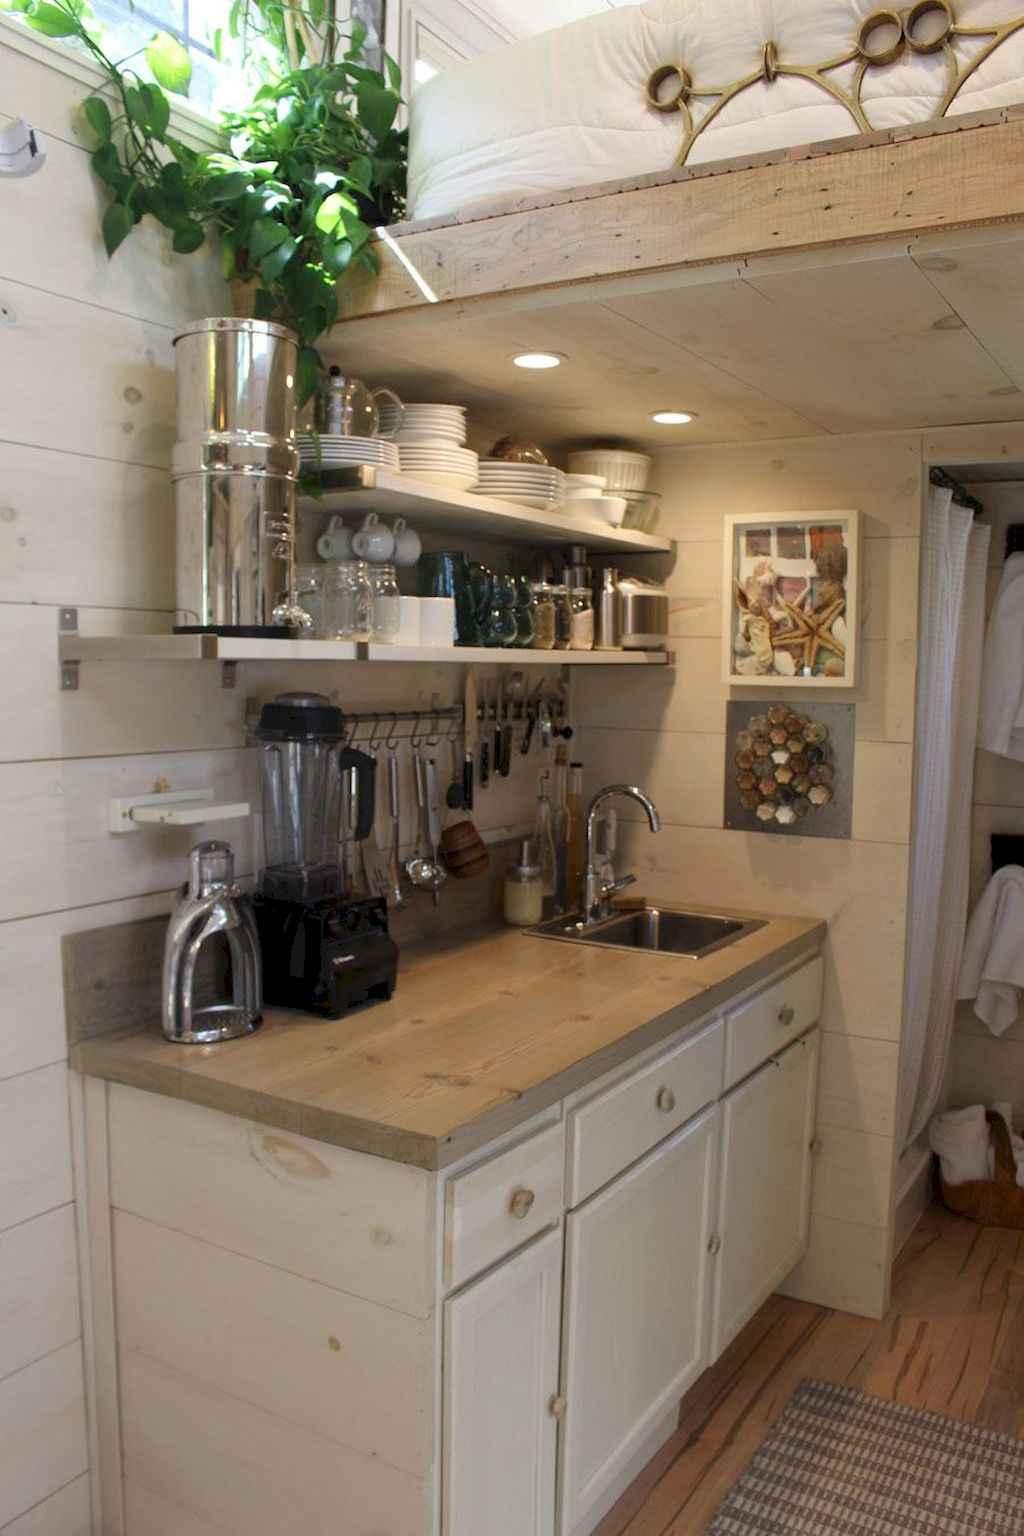 63 Tiny House Kitchen Storage Organization and Tips Ideas